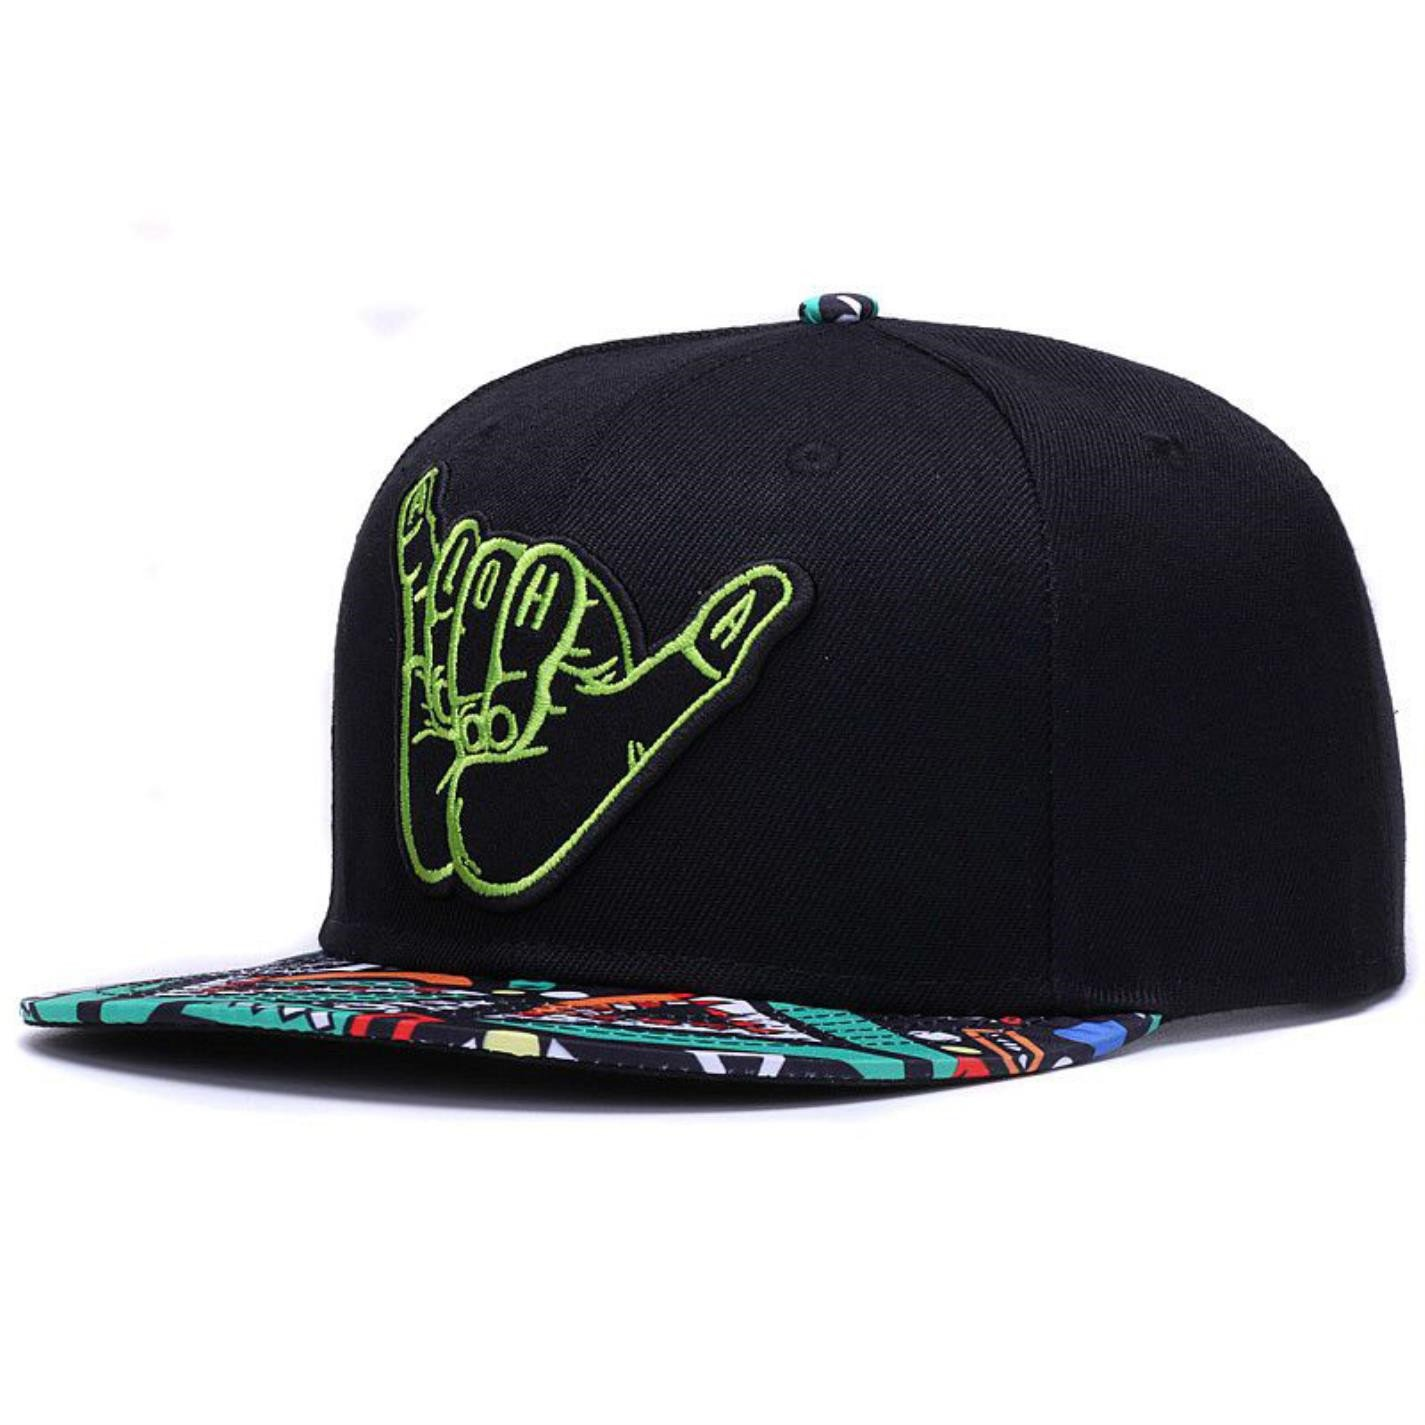 RWoRaP Embroidery Retro Baseball Men Women Bone Black Sports Hip Hop Cap Hat  at Amazon Women s Clothing store  0098ac26881